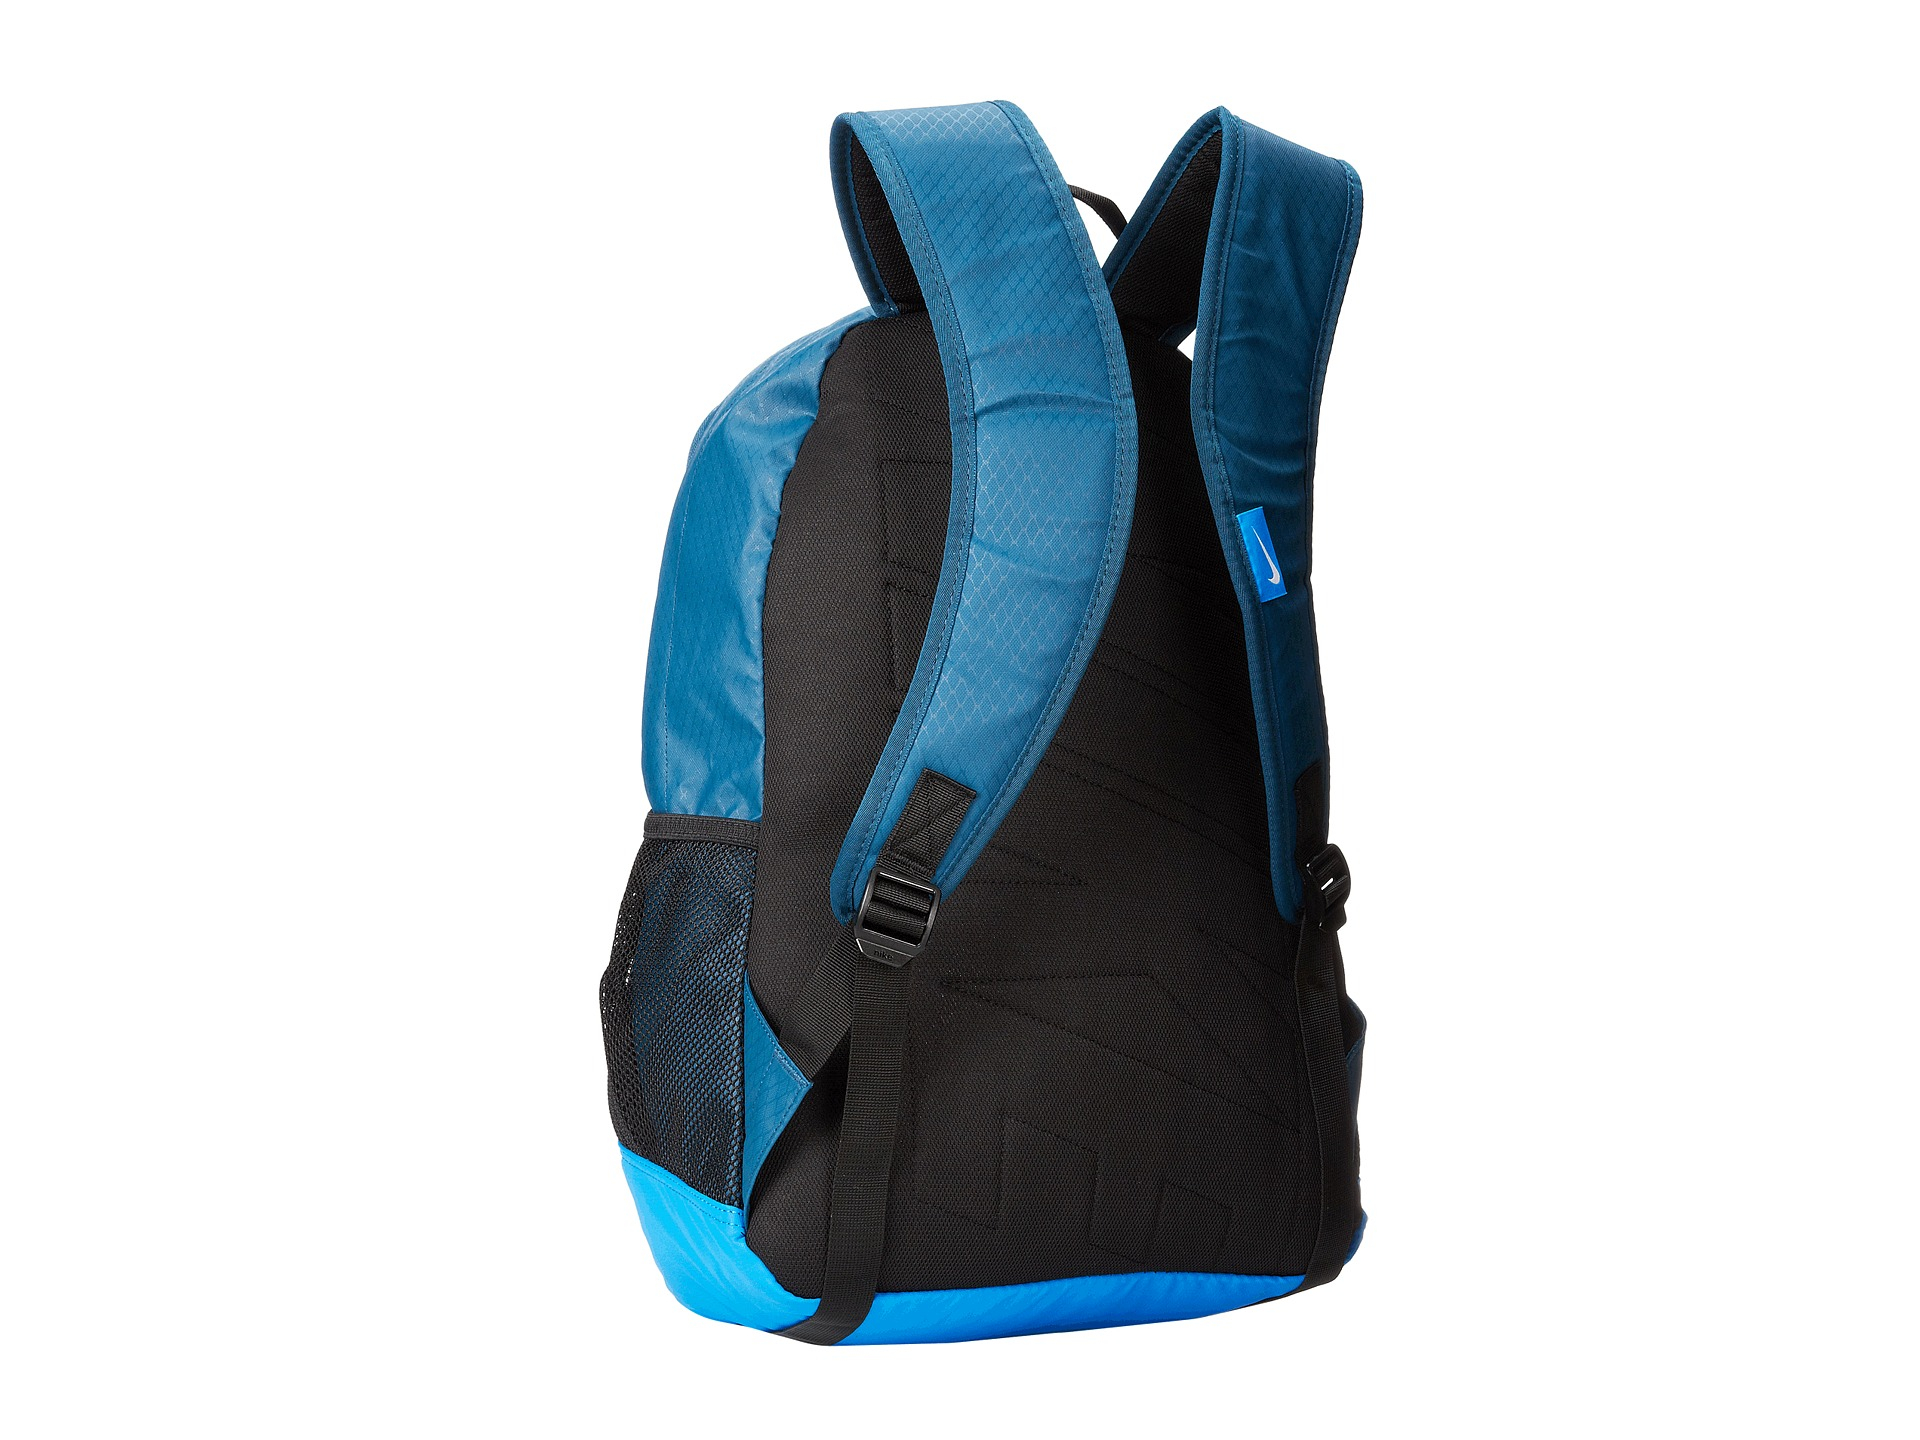 Lyst - Nike Team Training Medium Backpack in Blue 6eeef9828d494